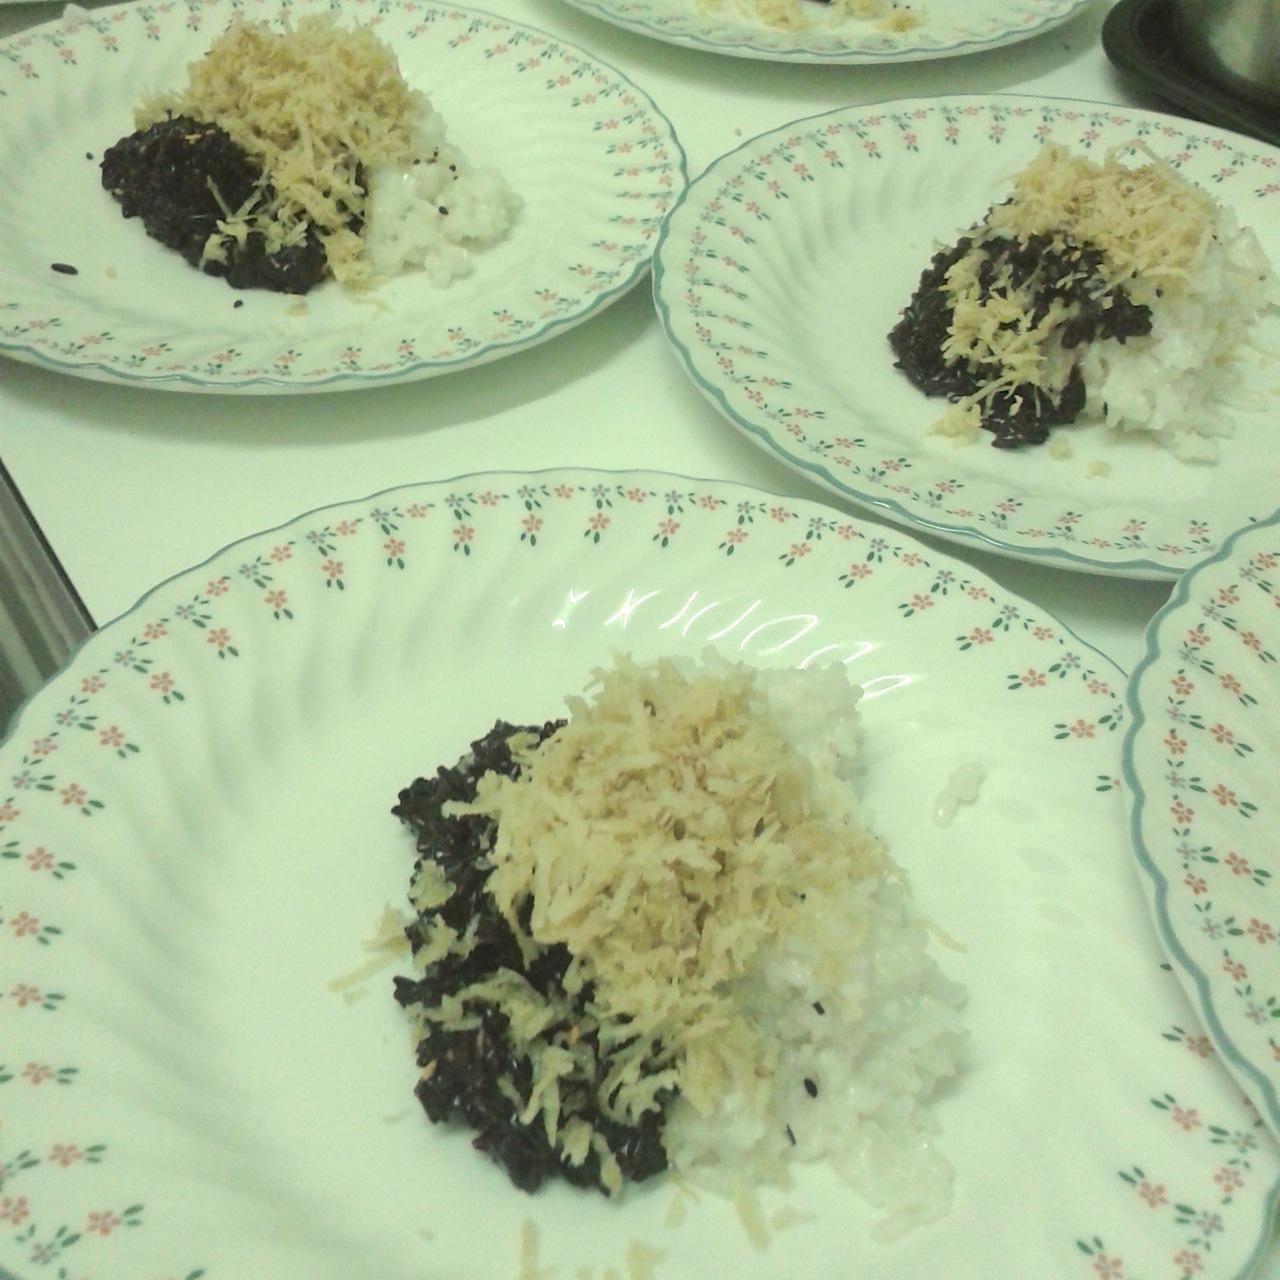 https://i1.wp.com/fatgayvegan.com/wp-content/uploads/2014/04/sticky-rice.jpg?fit=1280%2C1280